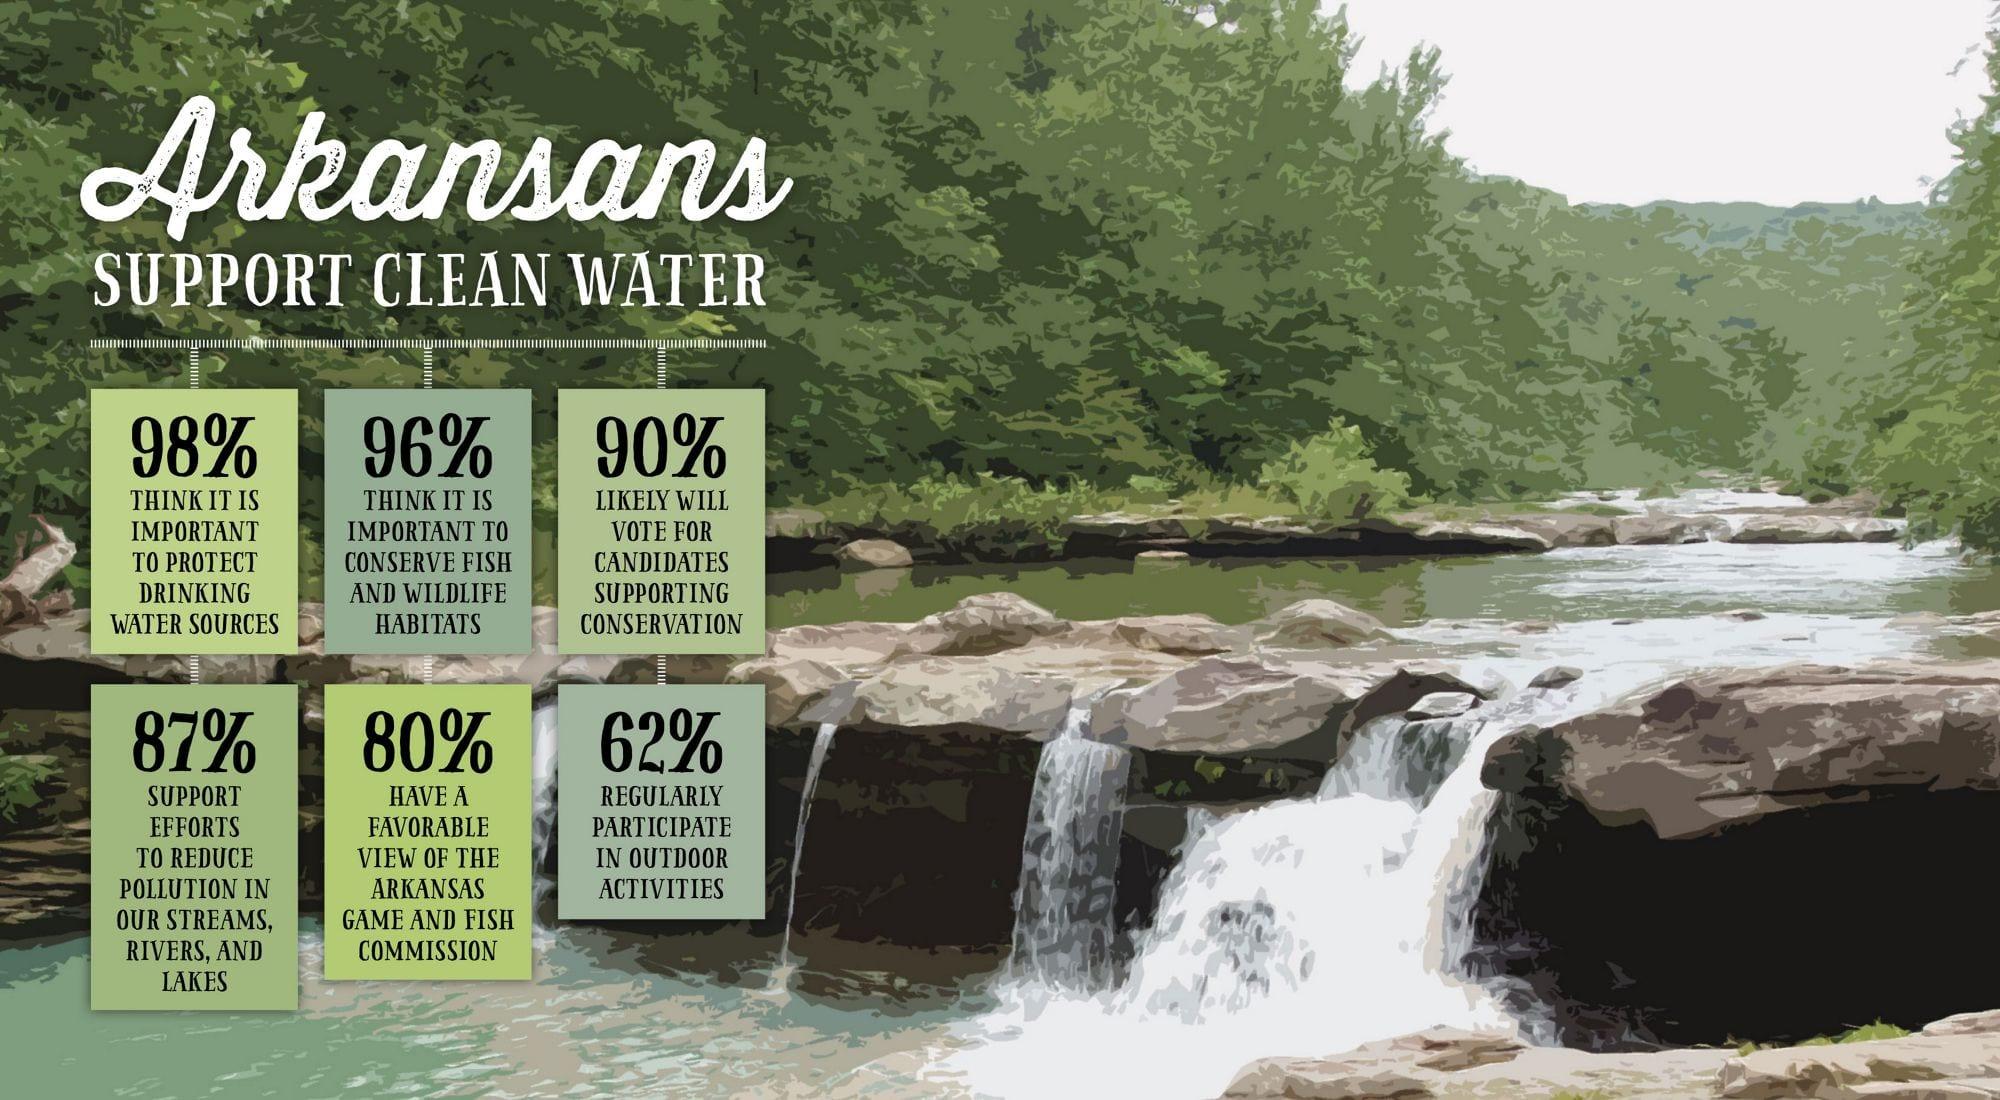 Arkansans Support Clean Water